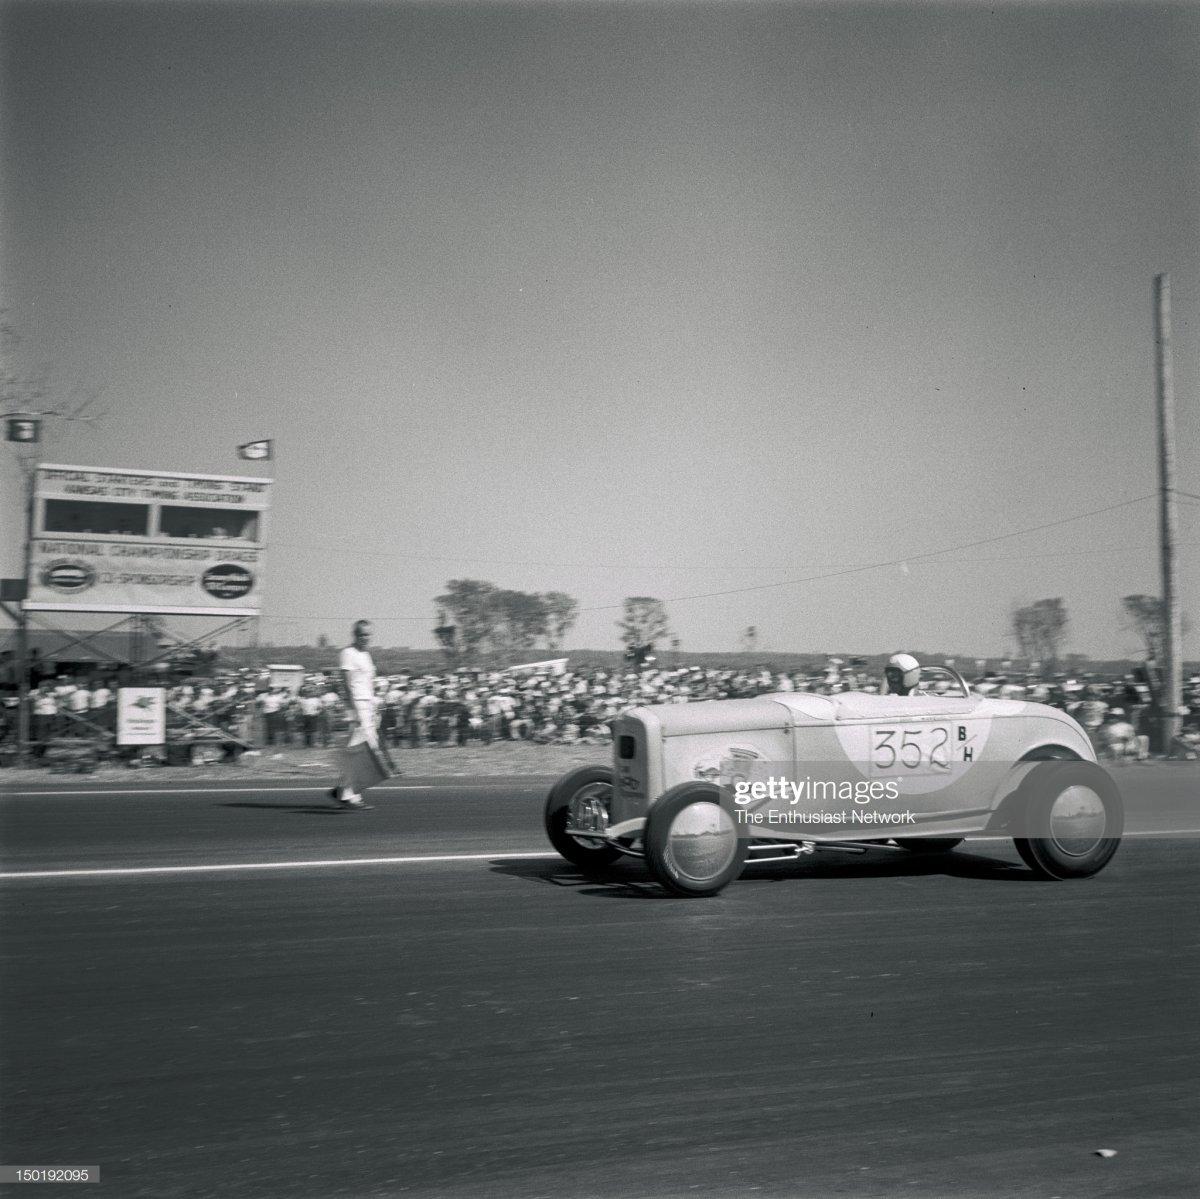 64 1956 National Championship Drag Races - Kansas City, Missouri 2 Dave Marquez.jpg